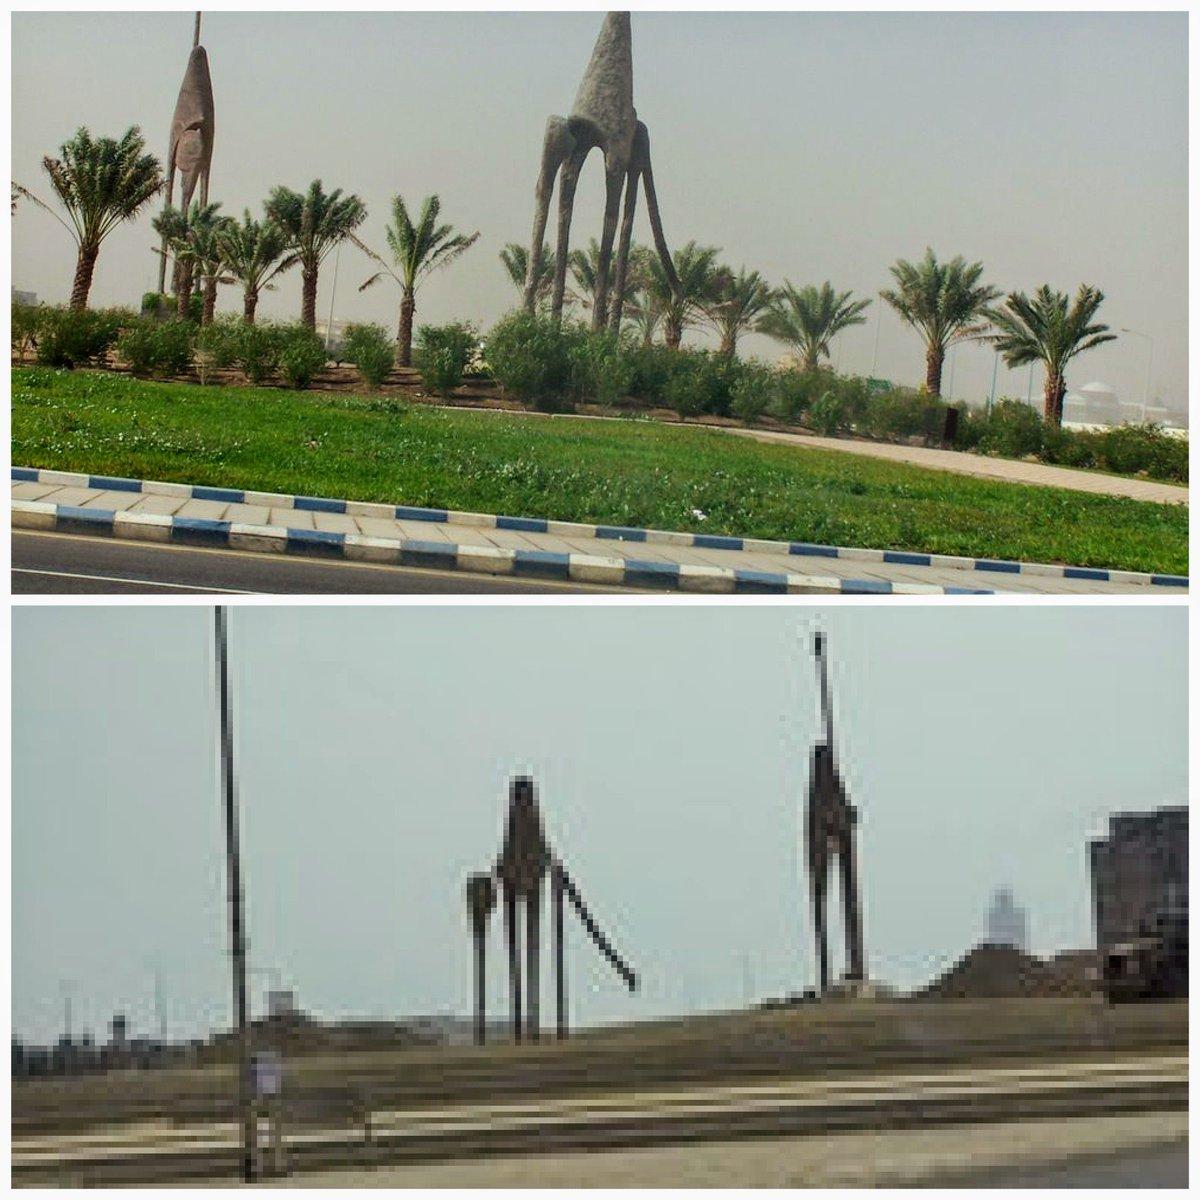 Camel Roundabout دوار الجمال أبحر 2